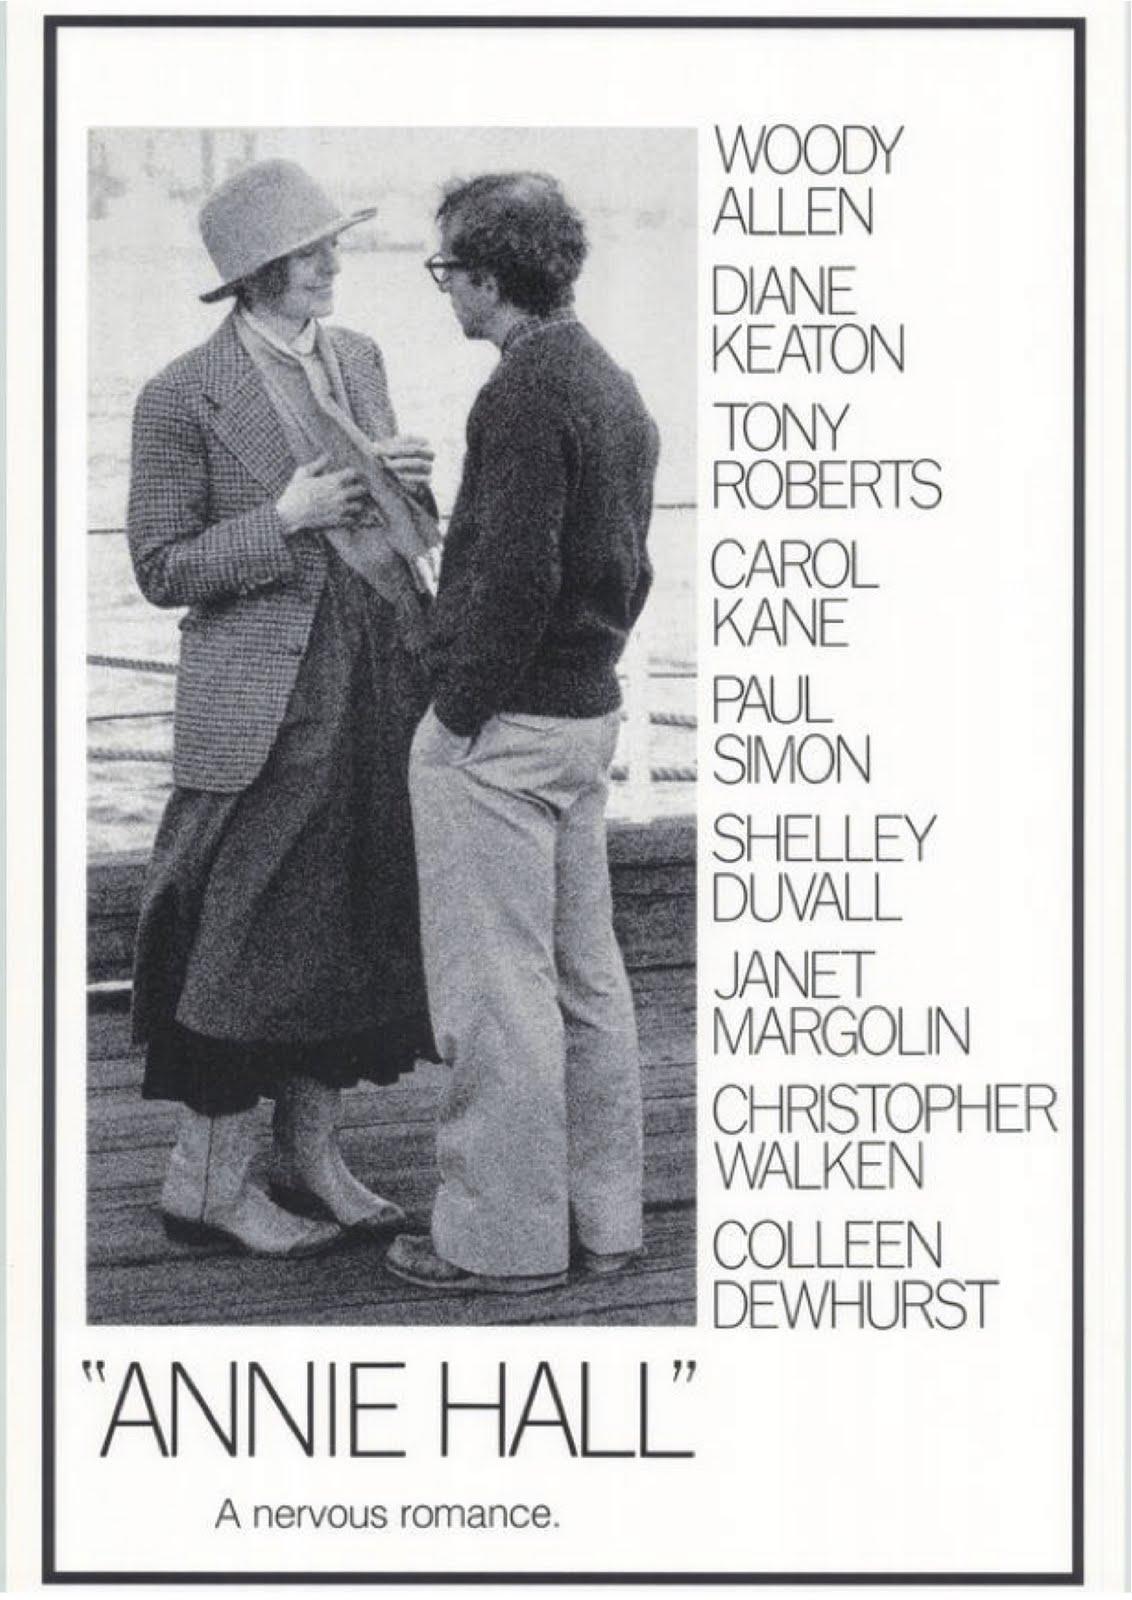 annie hall poster - photo #2